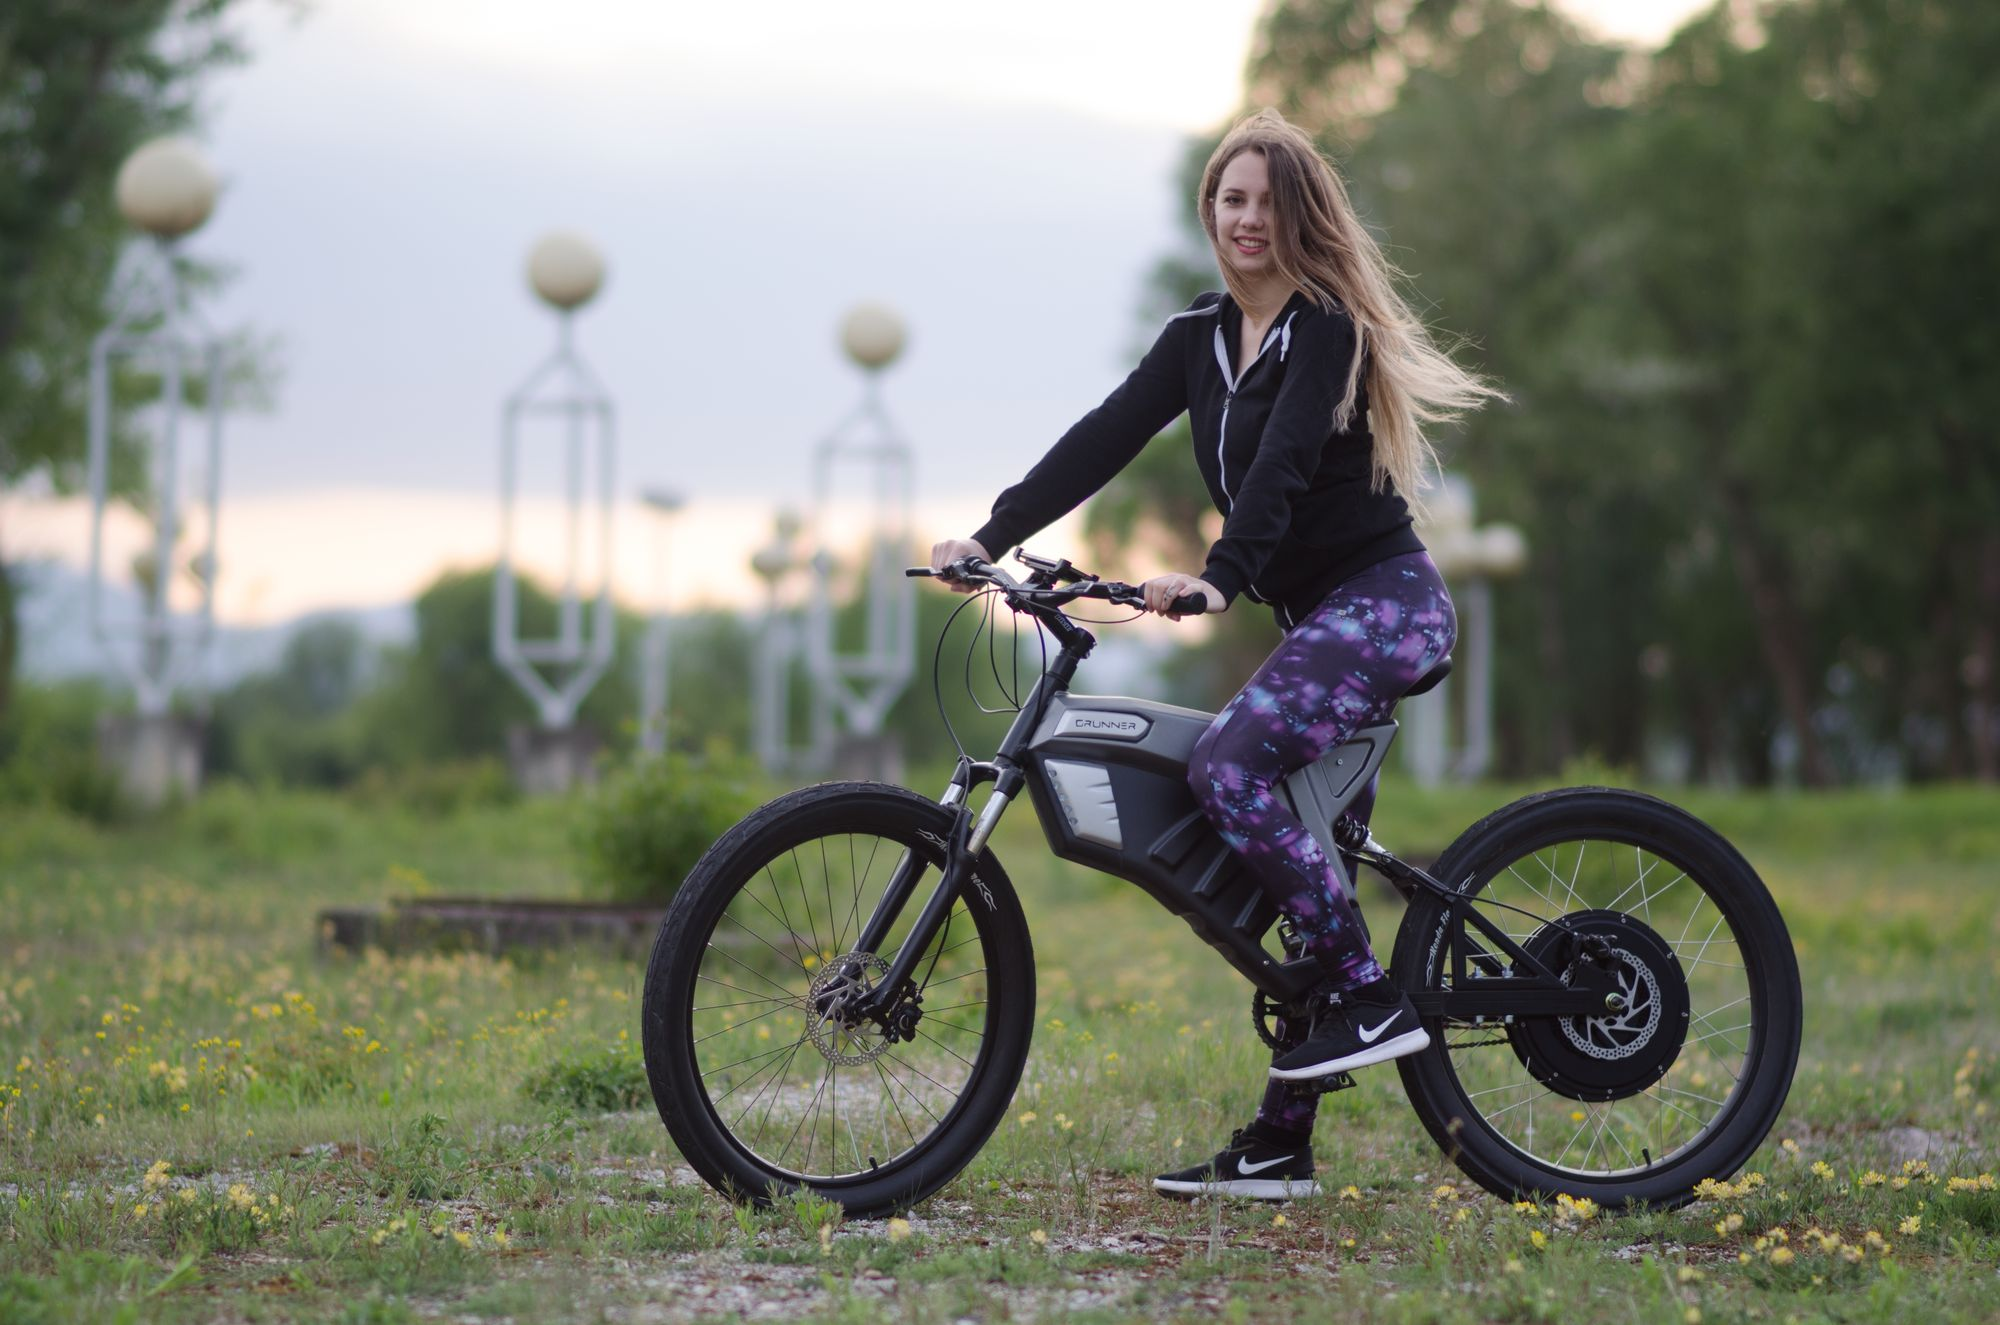 Croatian Electric Bike 'Grunner' Presented